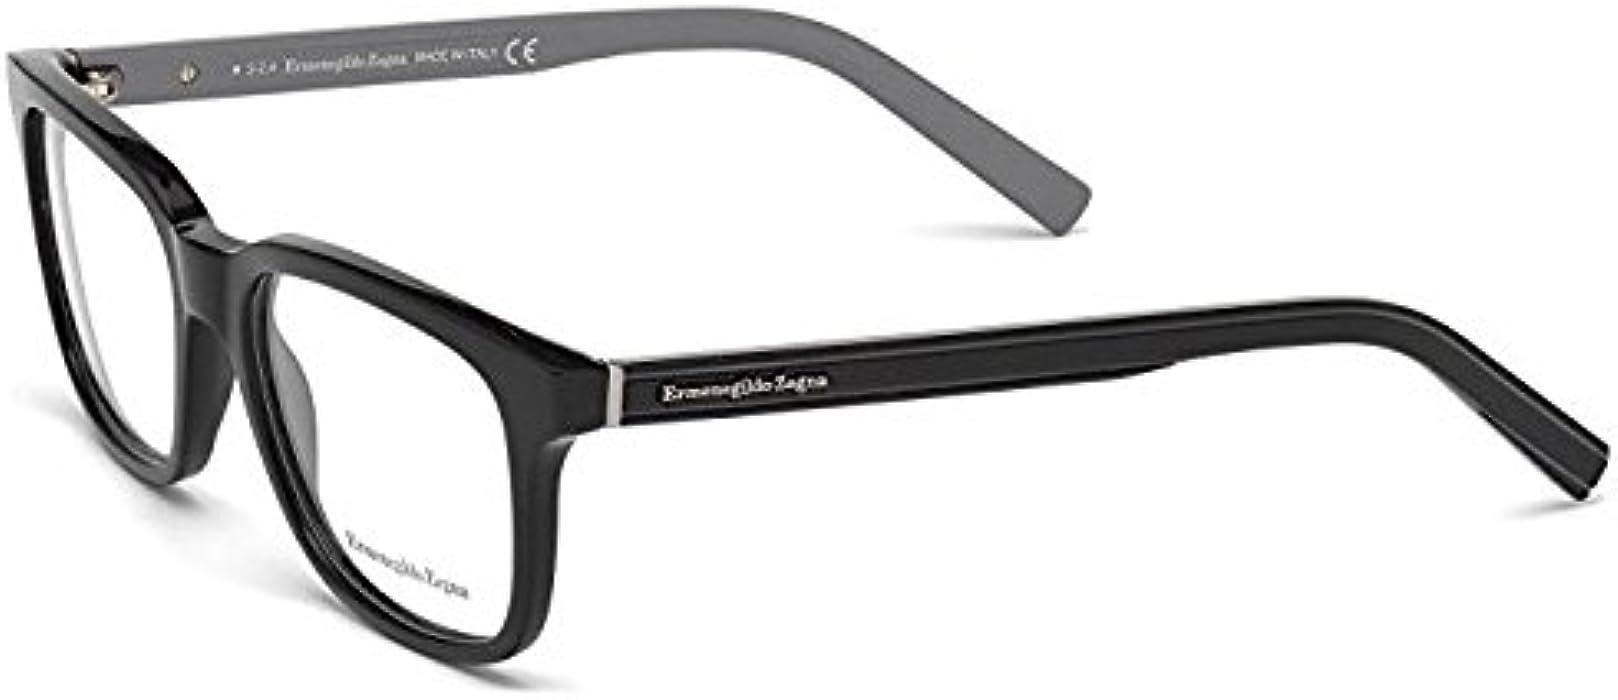 ec8552337a Amazon.com  Eyeglasses Ermenegildo Zegna EZ 5022 EZ5022 005 black other   Clothing